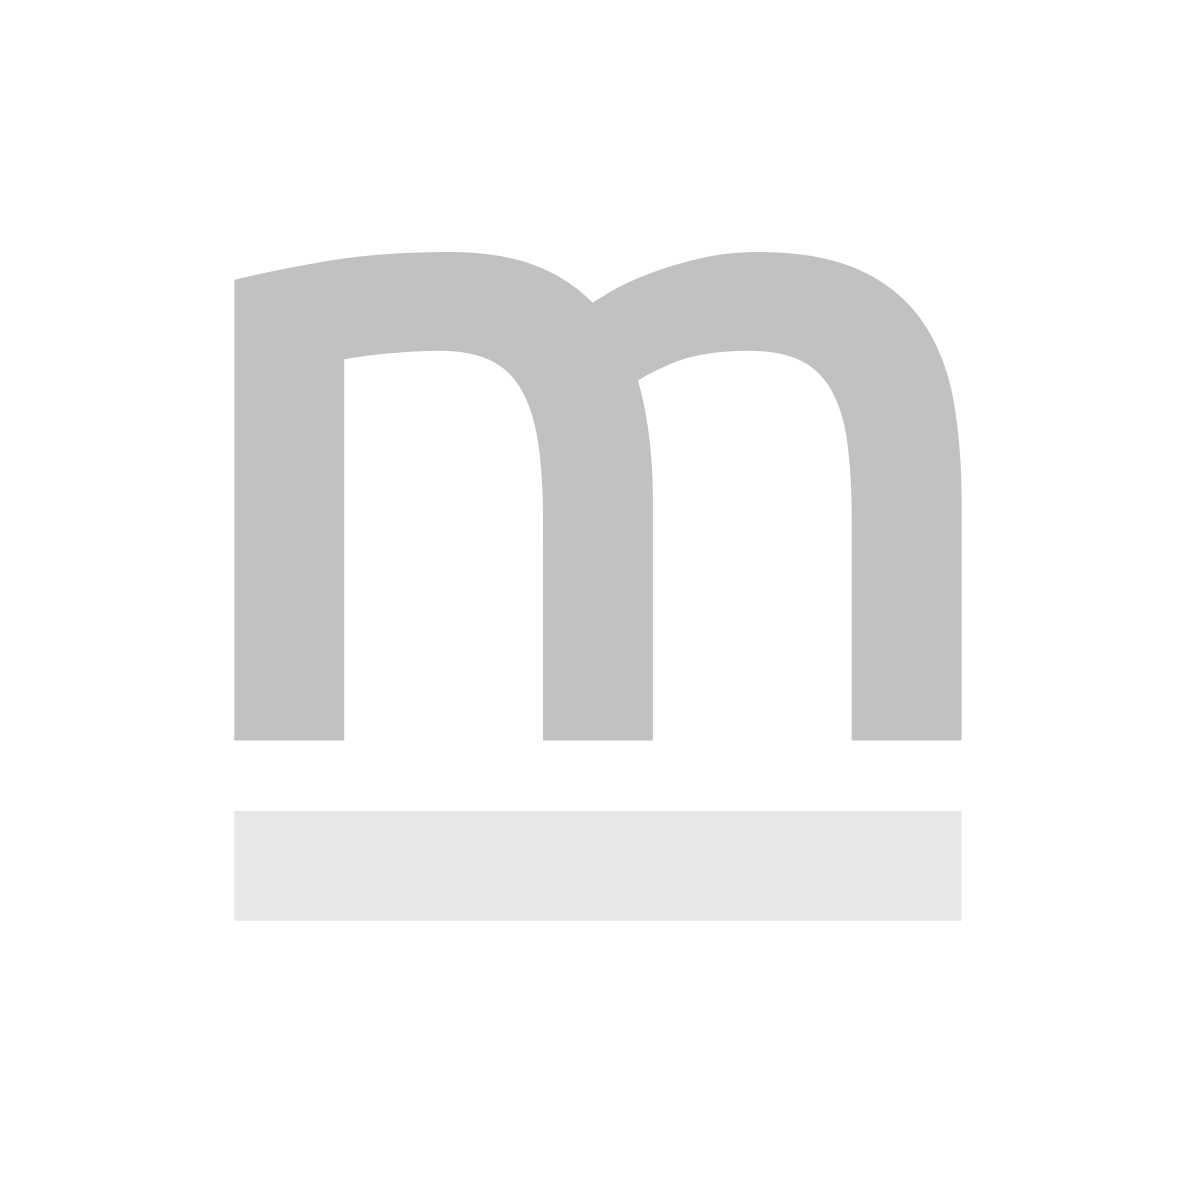 Krzesło CLAUDINE 1 VELVET GOLD beżowe